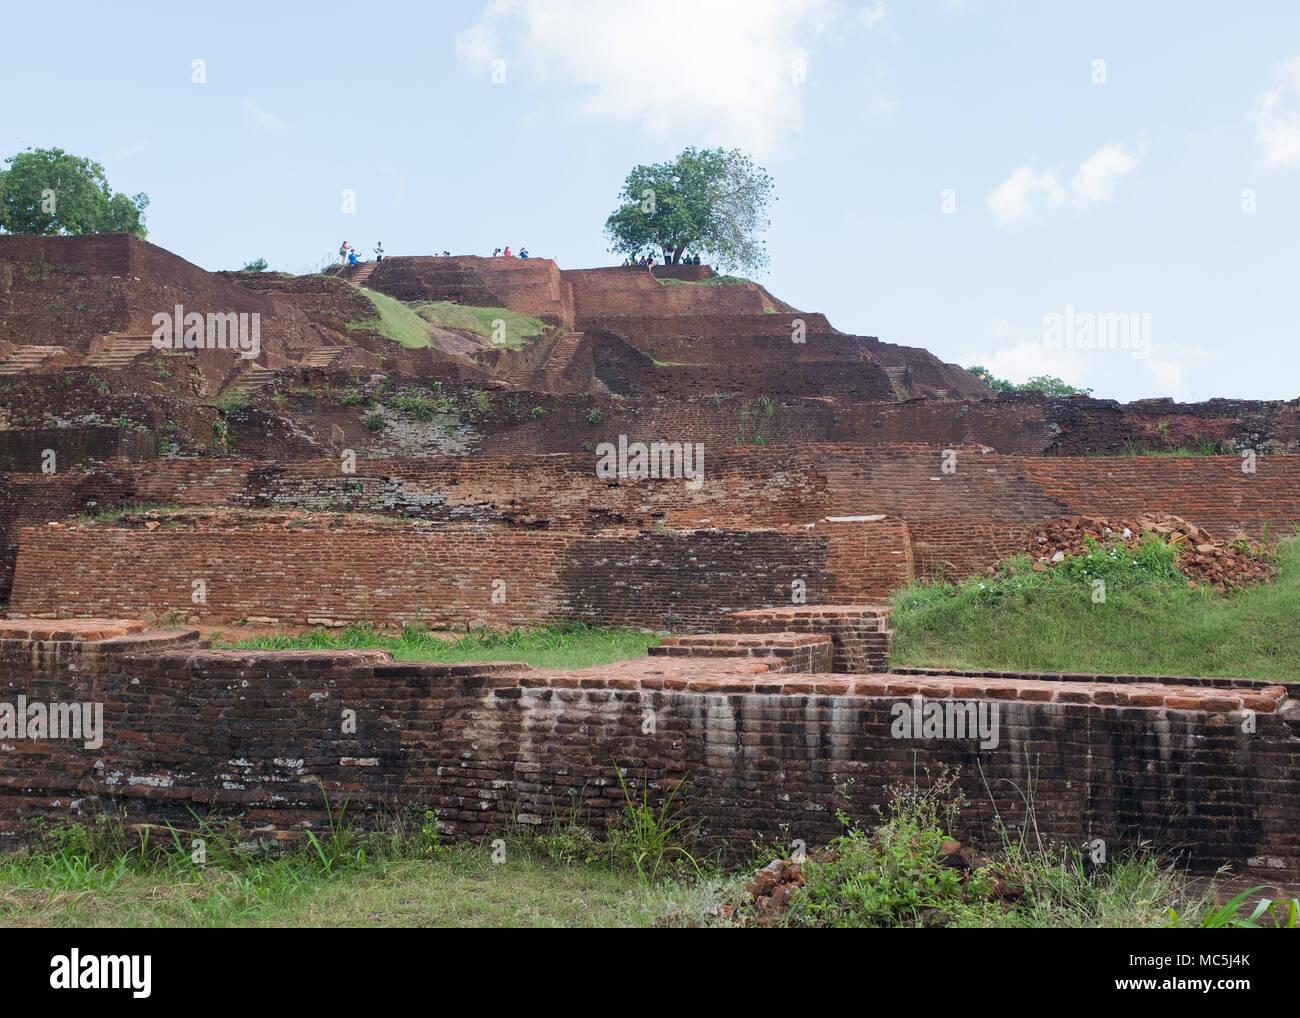 Los turistas en Roca de Sigiriya fortaleza, Provincia Central, Sri Lanka, Asia. Imagen De Stock